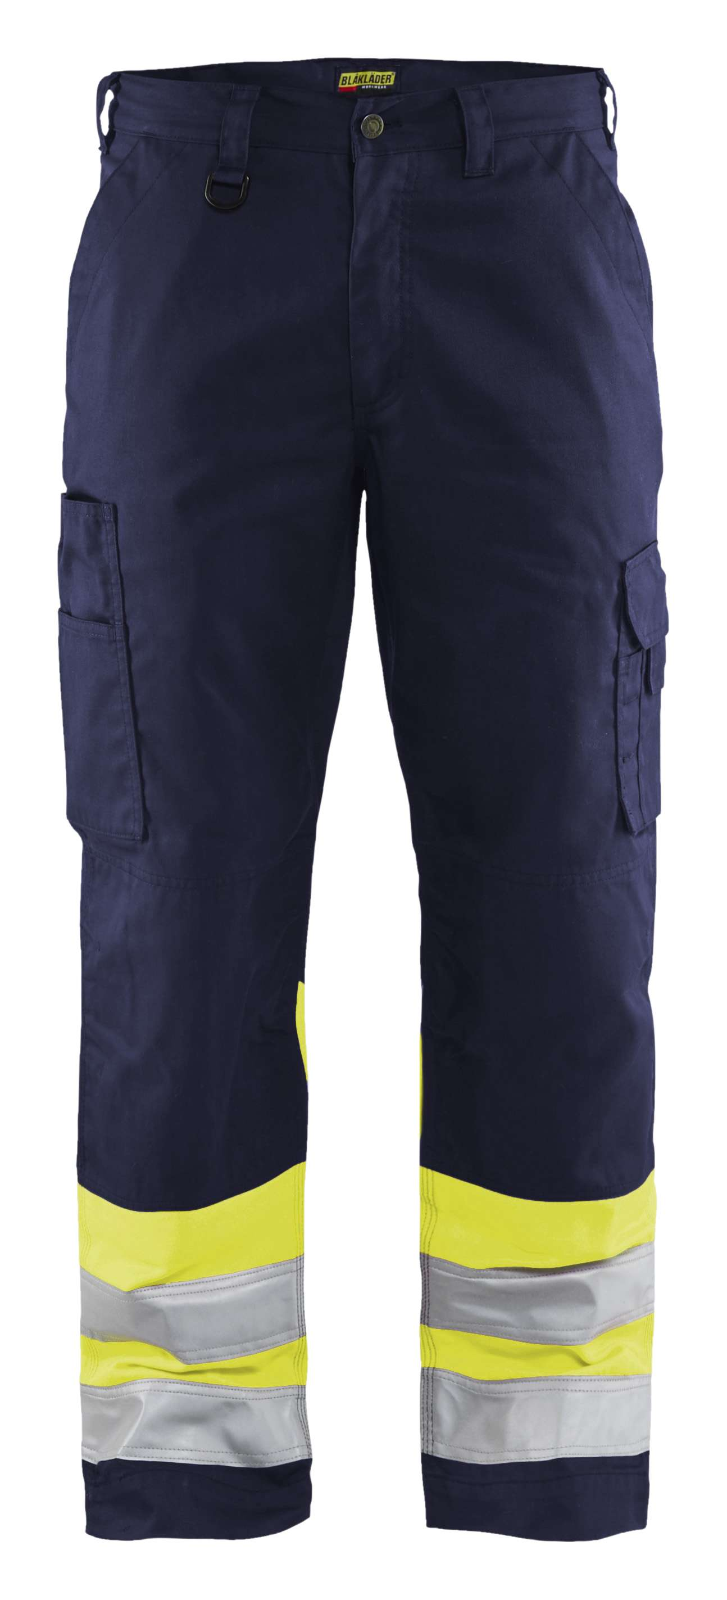 Blaklader Werkbroeken 15641811 High Vis marineblauw-geel(8933)